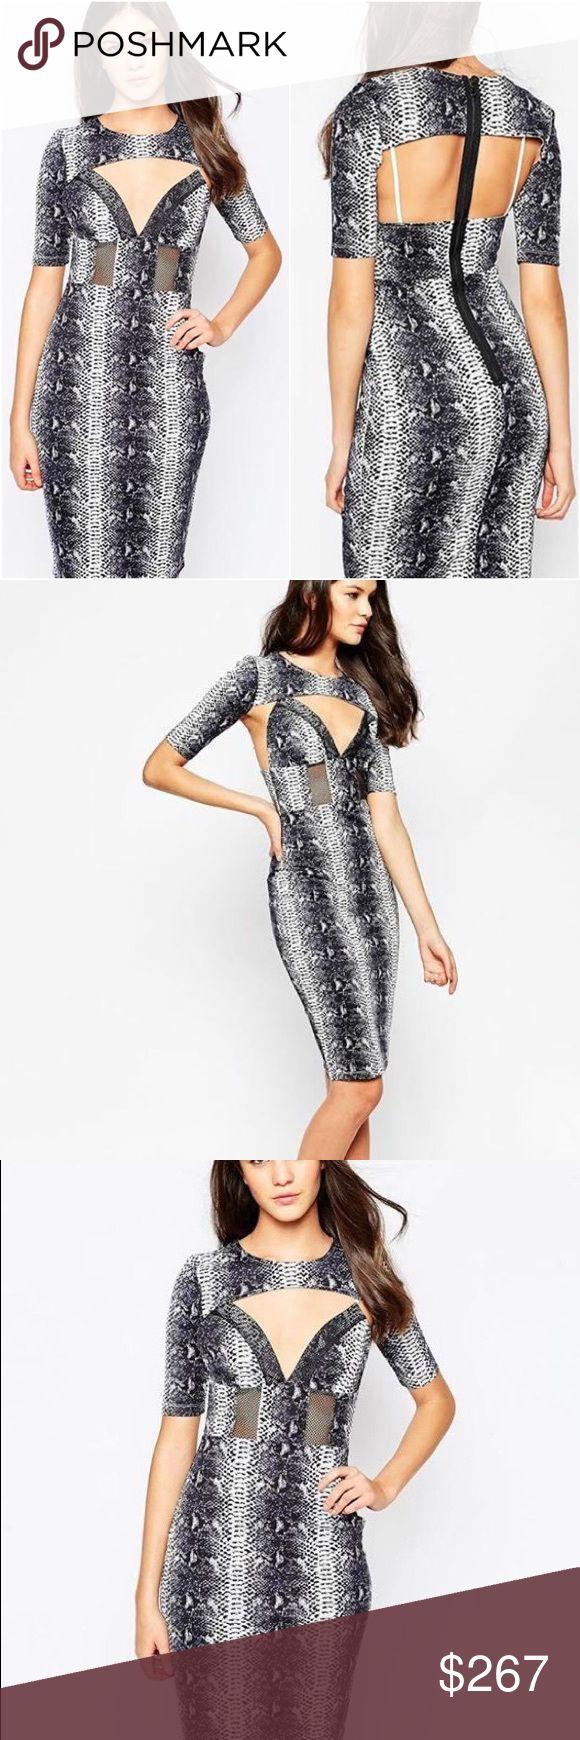 Stylestalker Bodycon Python Print Cut Out Dress 2 Be daring in this python print cut out dress by Stylestalker. Size 2. New with tags's. Stylestalker Dresses Midi